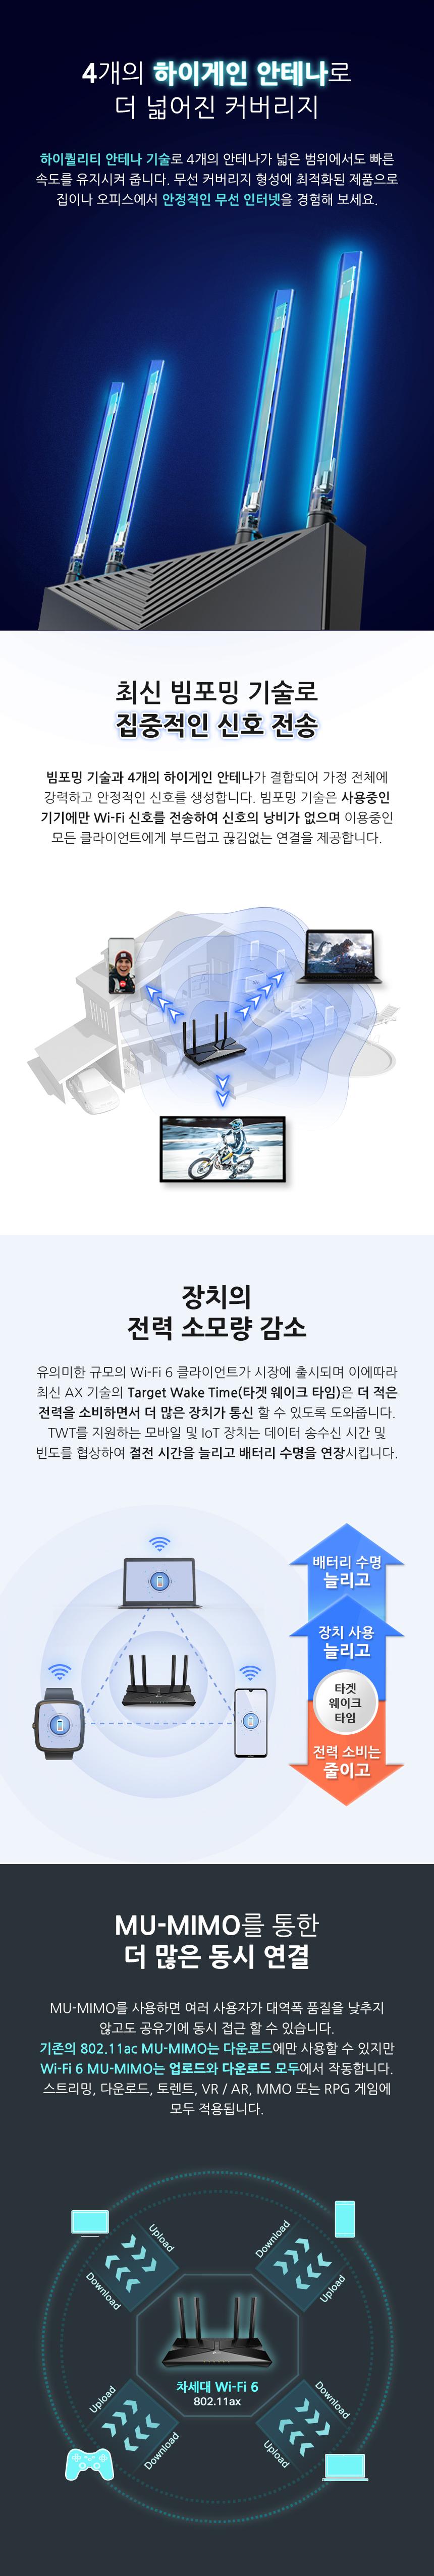 TP-LINK Archer AX50 유무선공유기